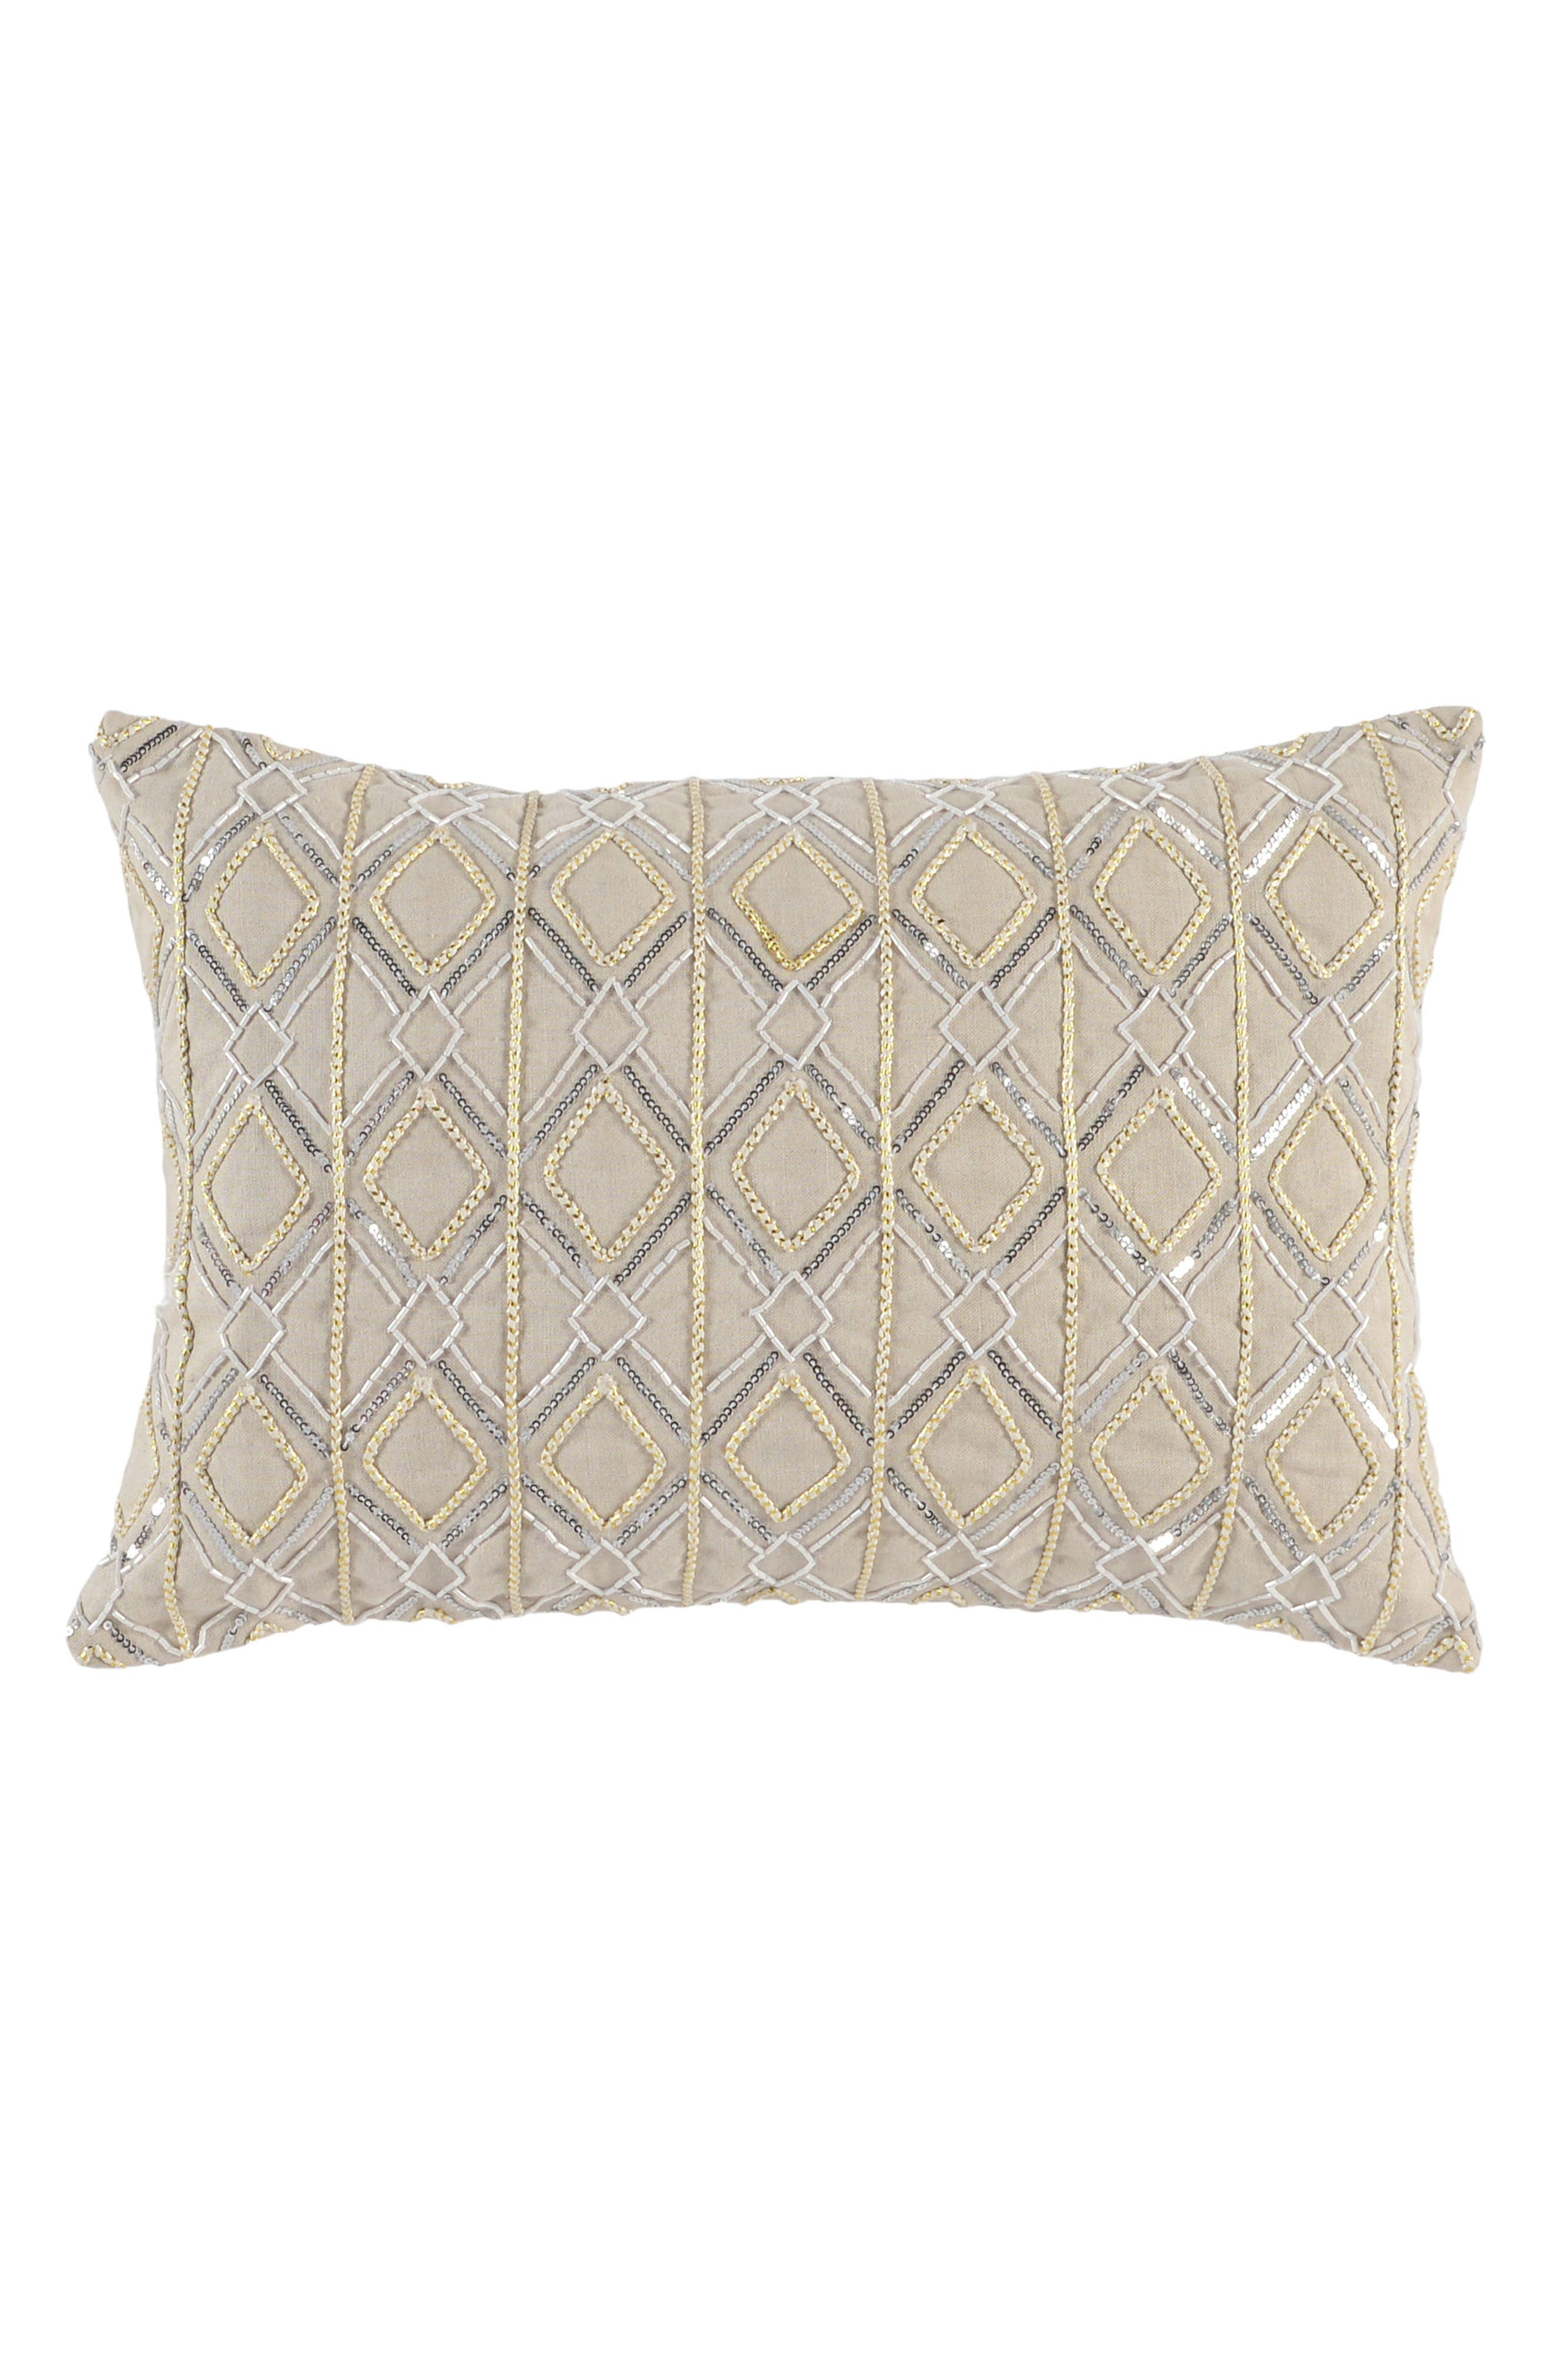 Aledo Accent Pillow,                             Main thumbnail 1, color,                             900